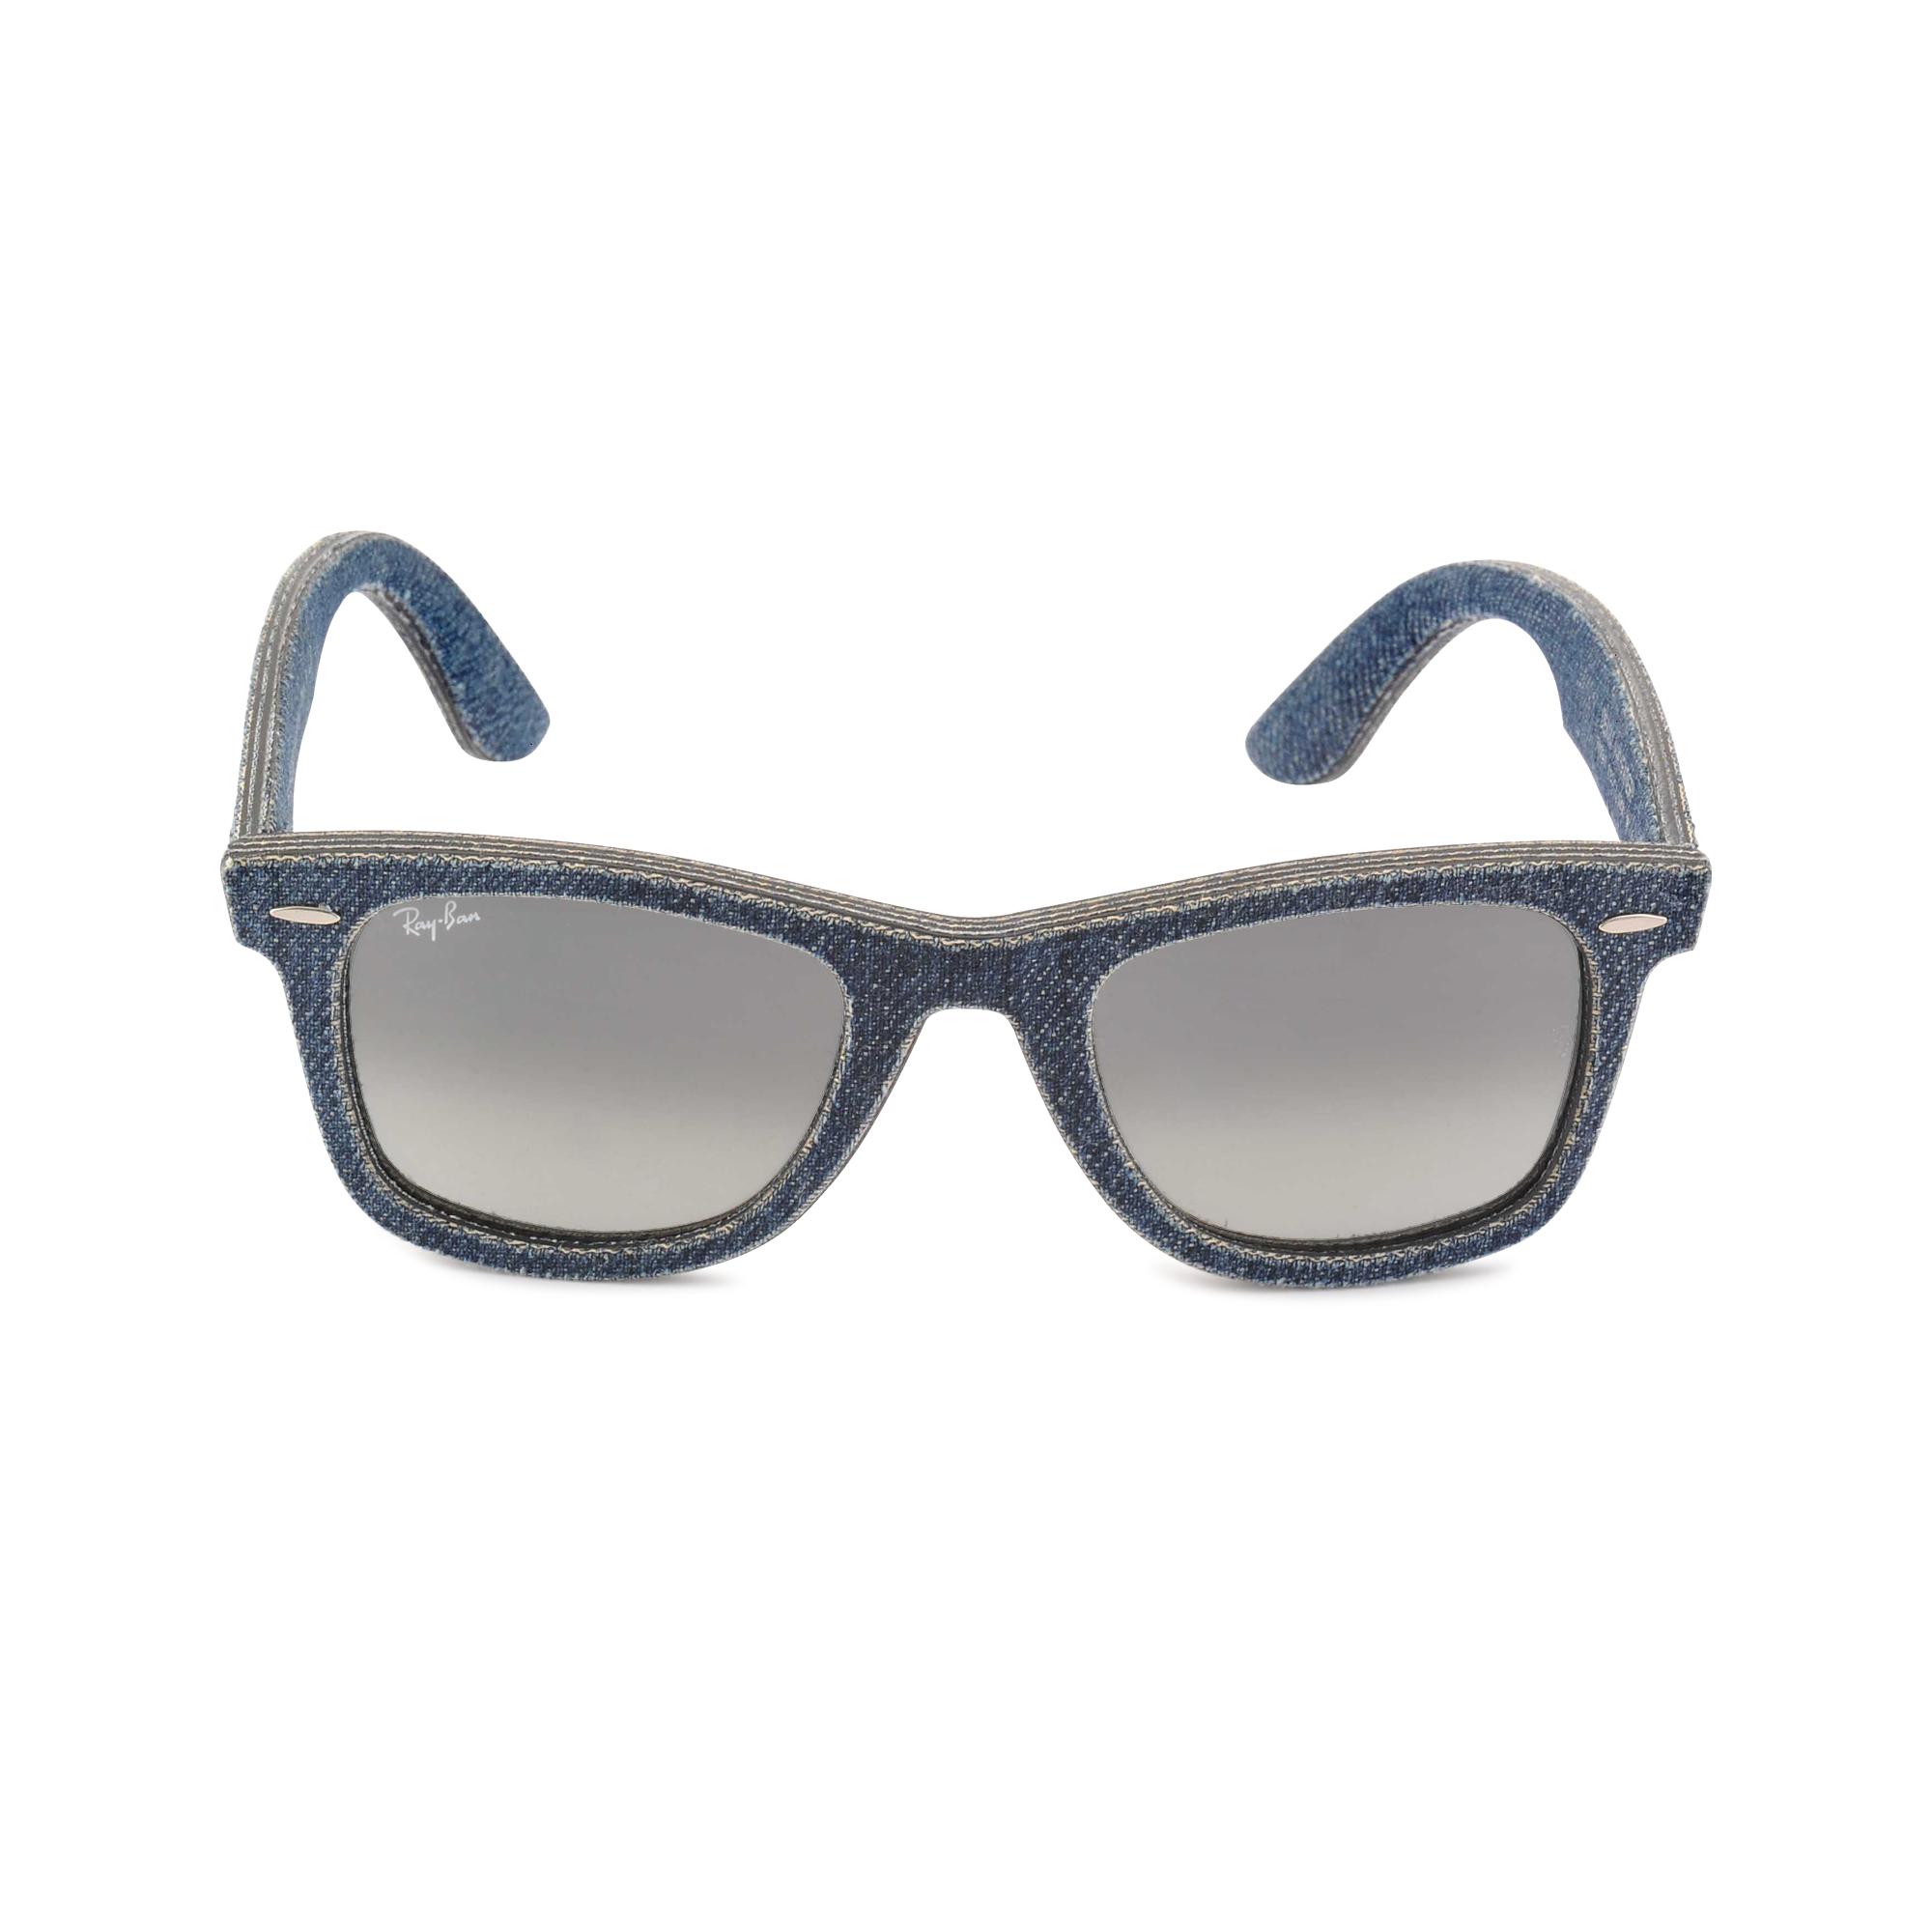 cae2b0d4be4 Ray Ban Style Sunglasses Ebay - Bitterroot Public Library